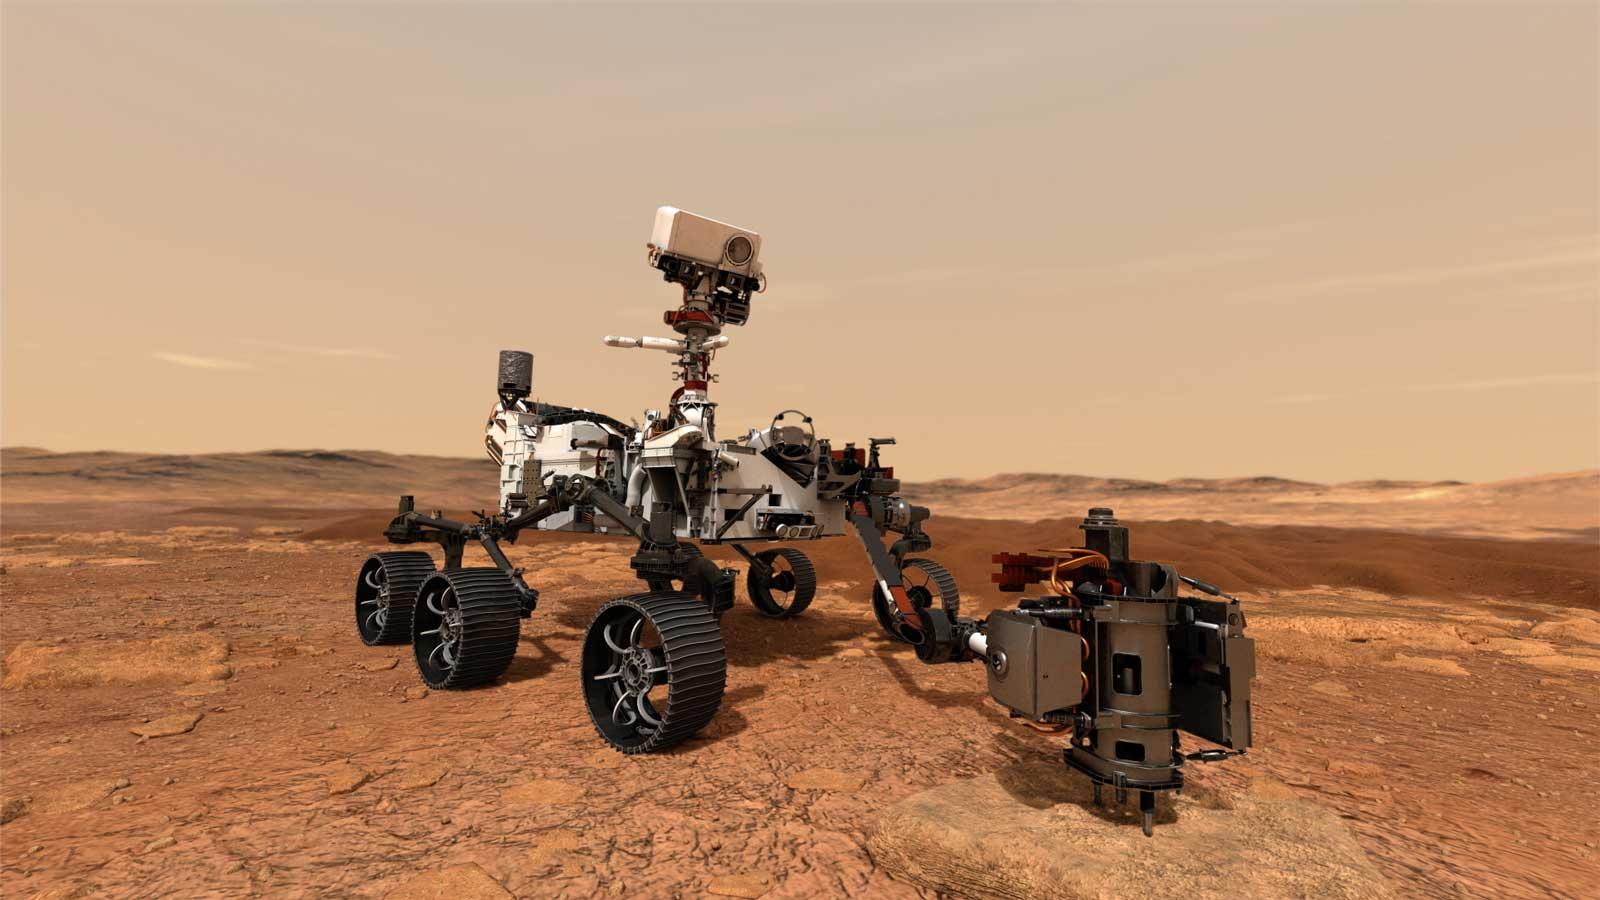 Artist's rendering of Perseverance on Mars